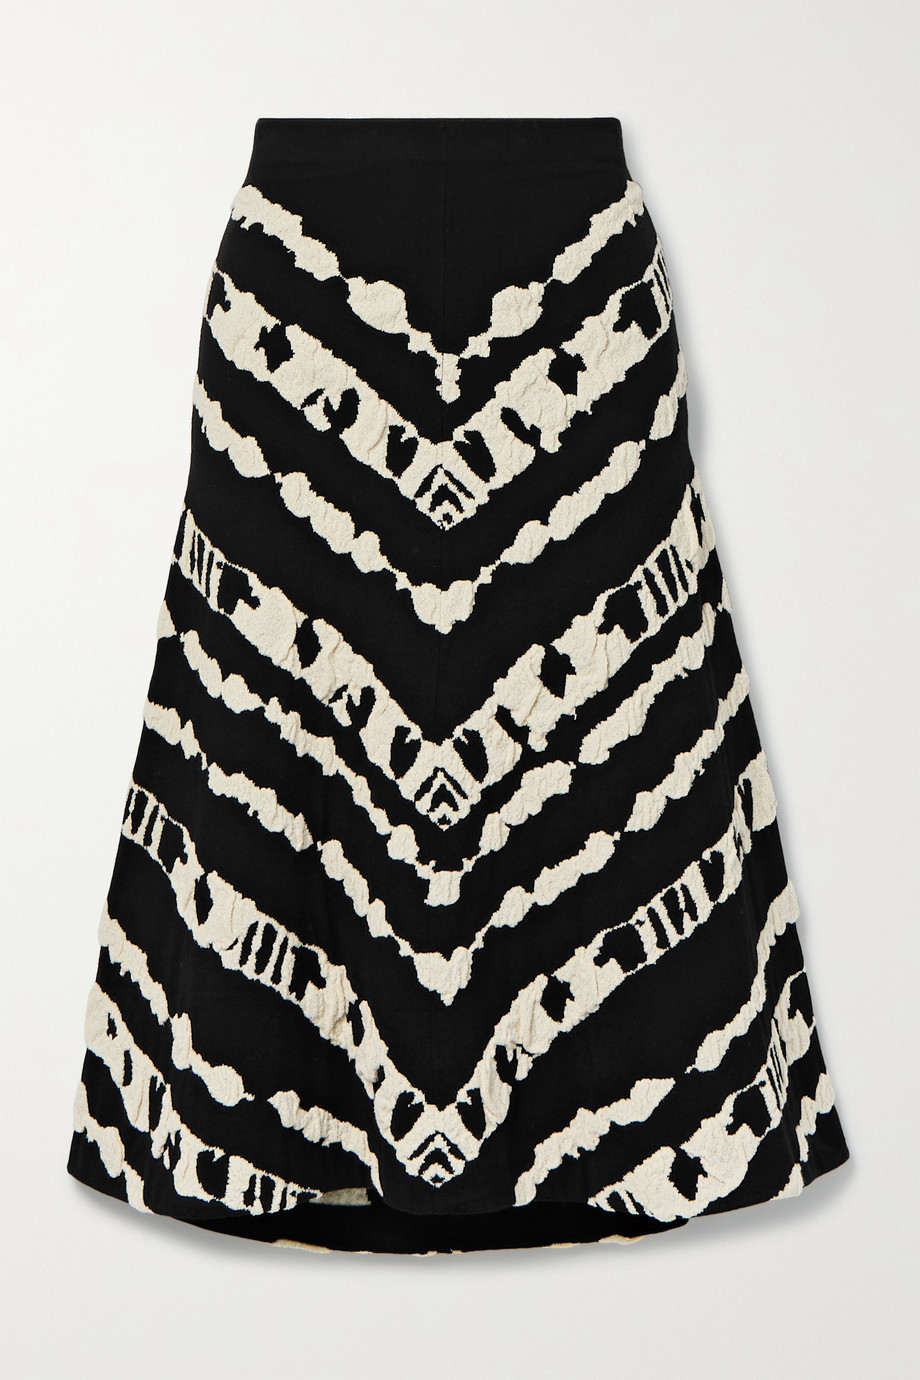 Proenza Schouler White Label Jacquard-knit midi skirt